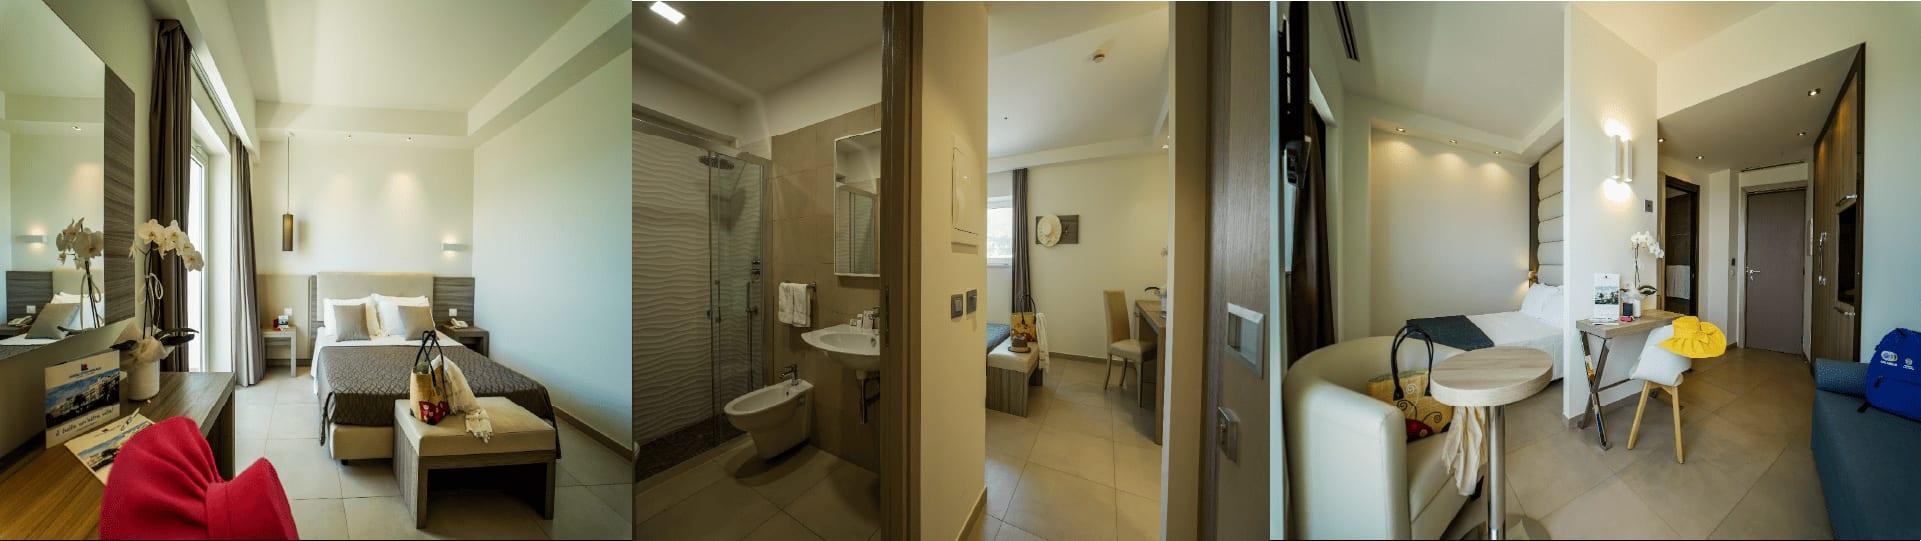 view of hotel- bedroom, bathroom, living area image